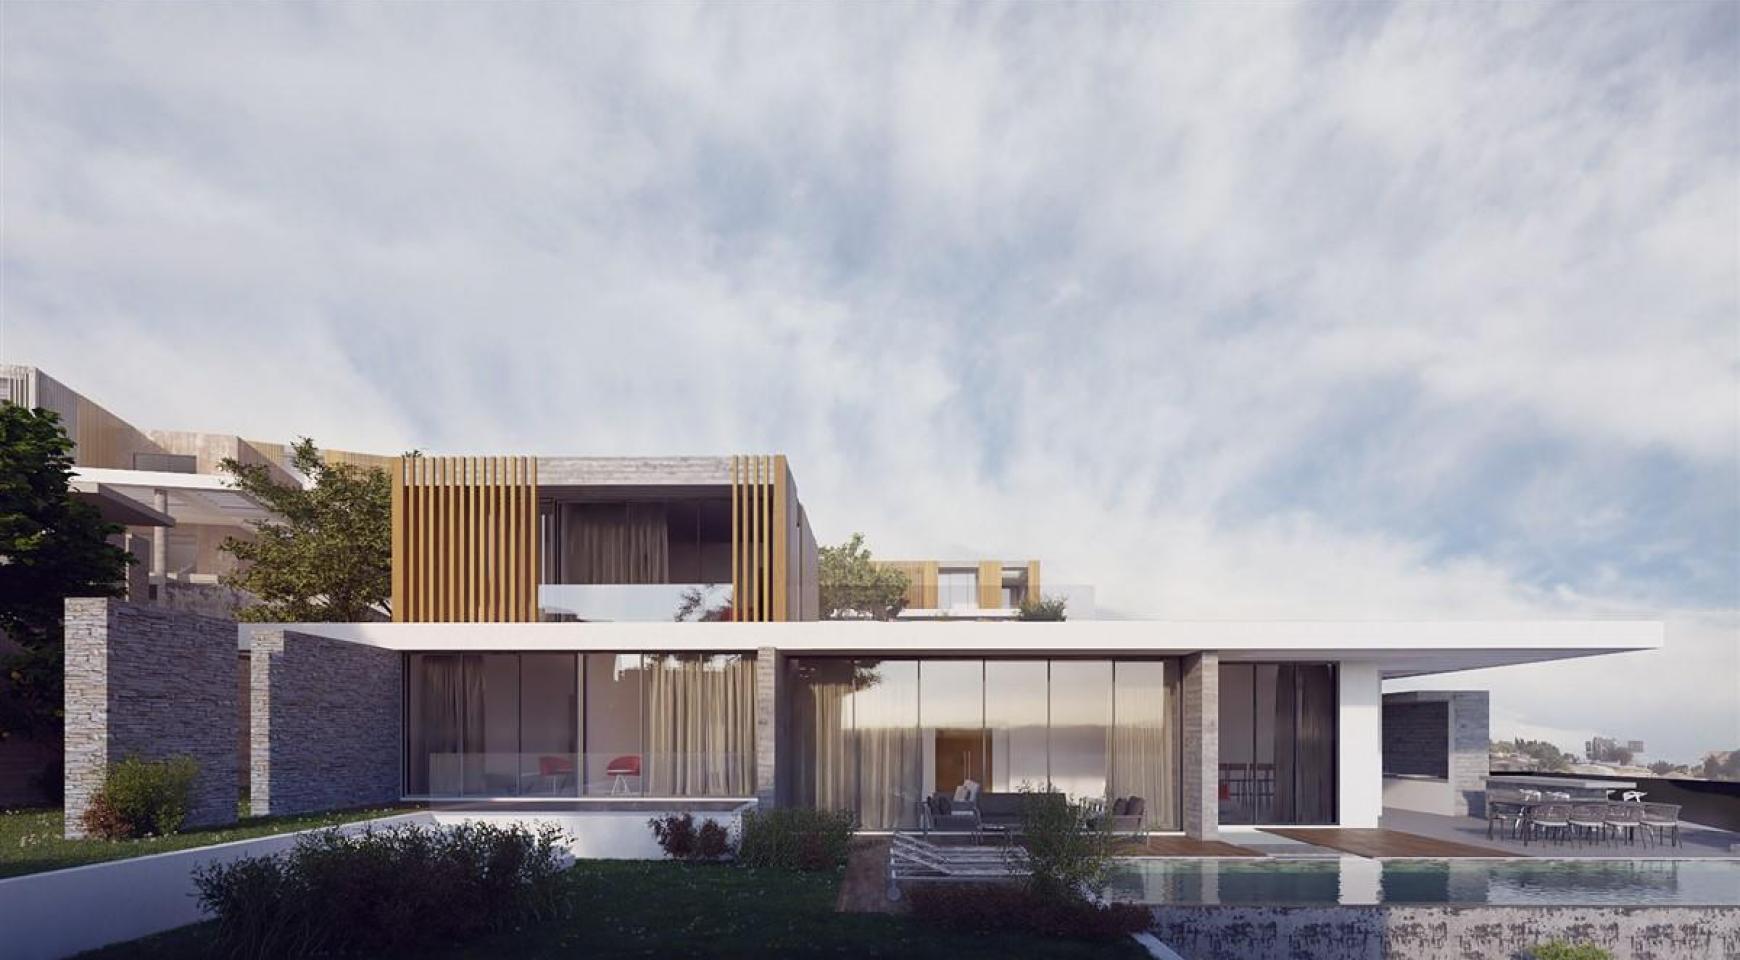 Exclusive 4 Bedroom Villa with Stunning Views in Germasogeia - 4